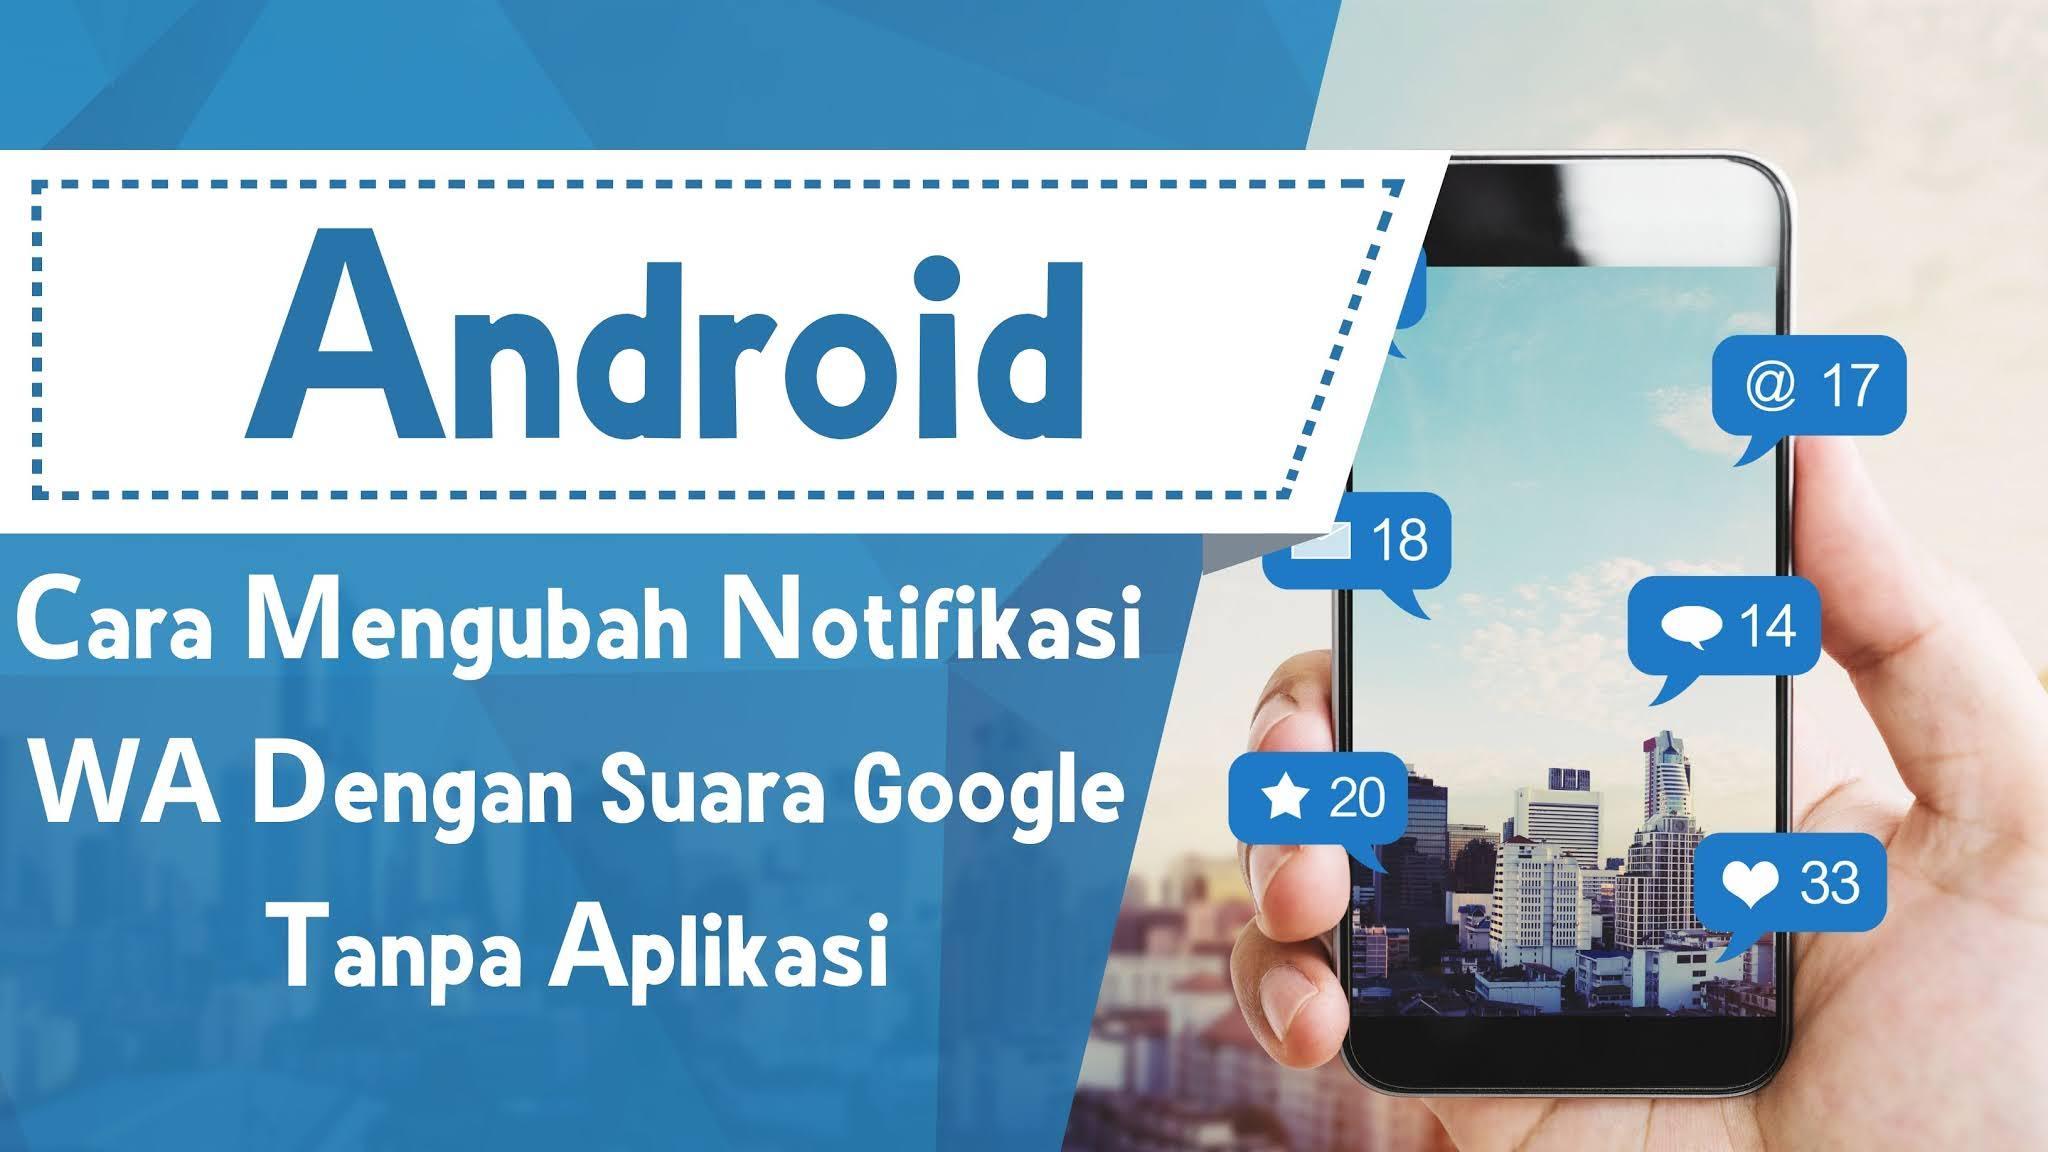 Cara Mengubah Notifikasi WA Dengan Suara Google Tanpa Aplikasi